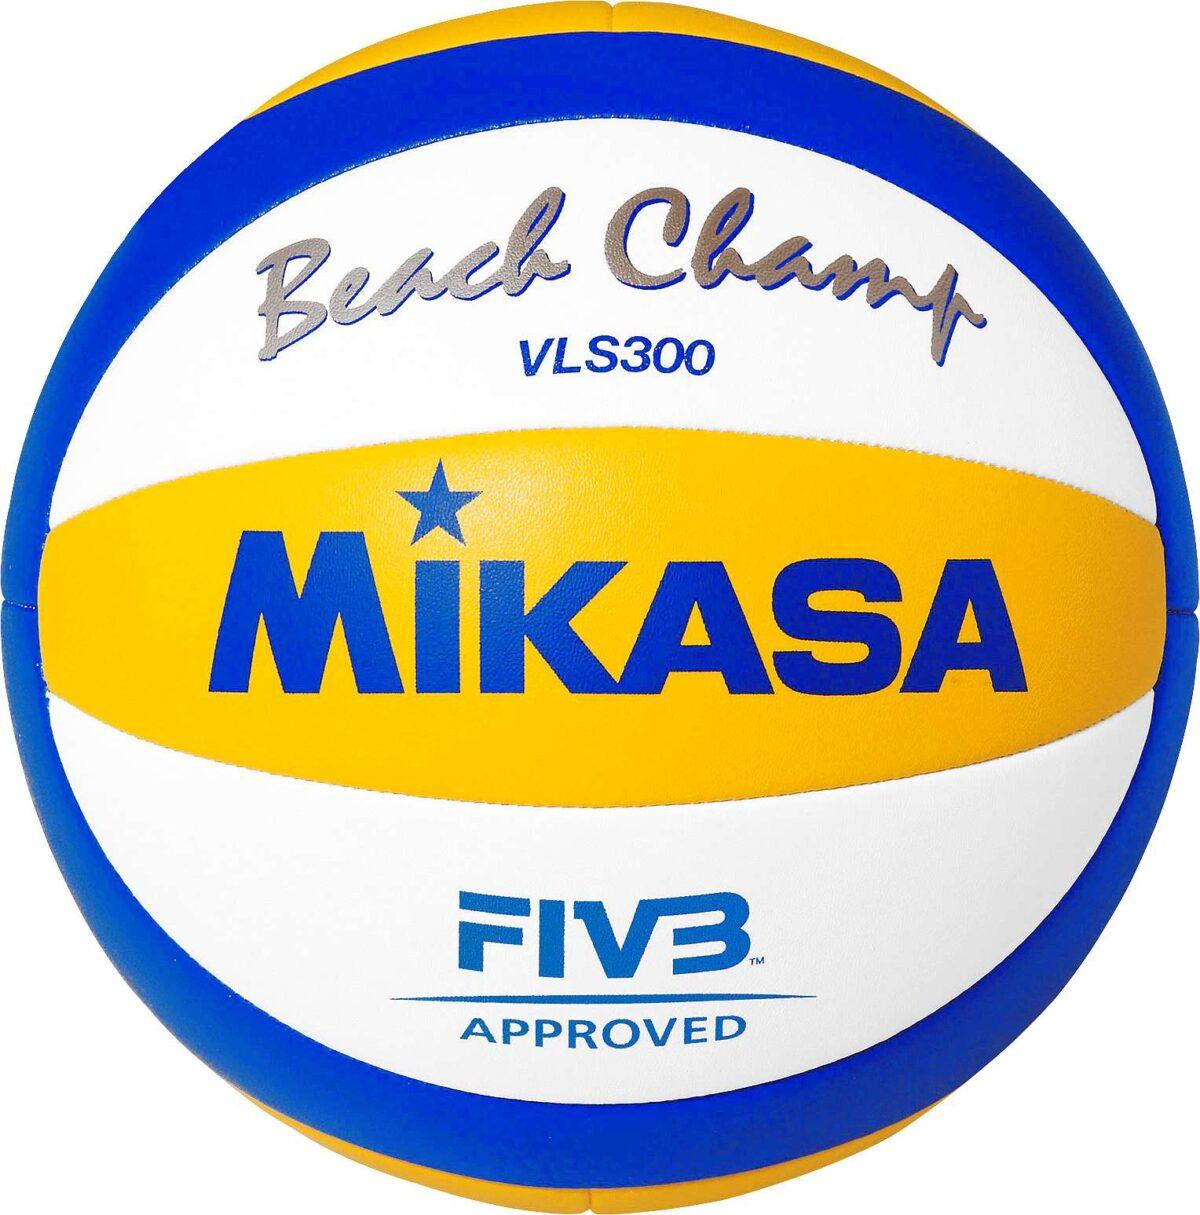 Mikasa Beachvolleyball Beach Champ VLS300 DVV - Bälle - Mikasa